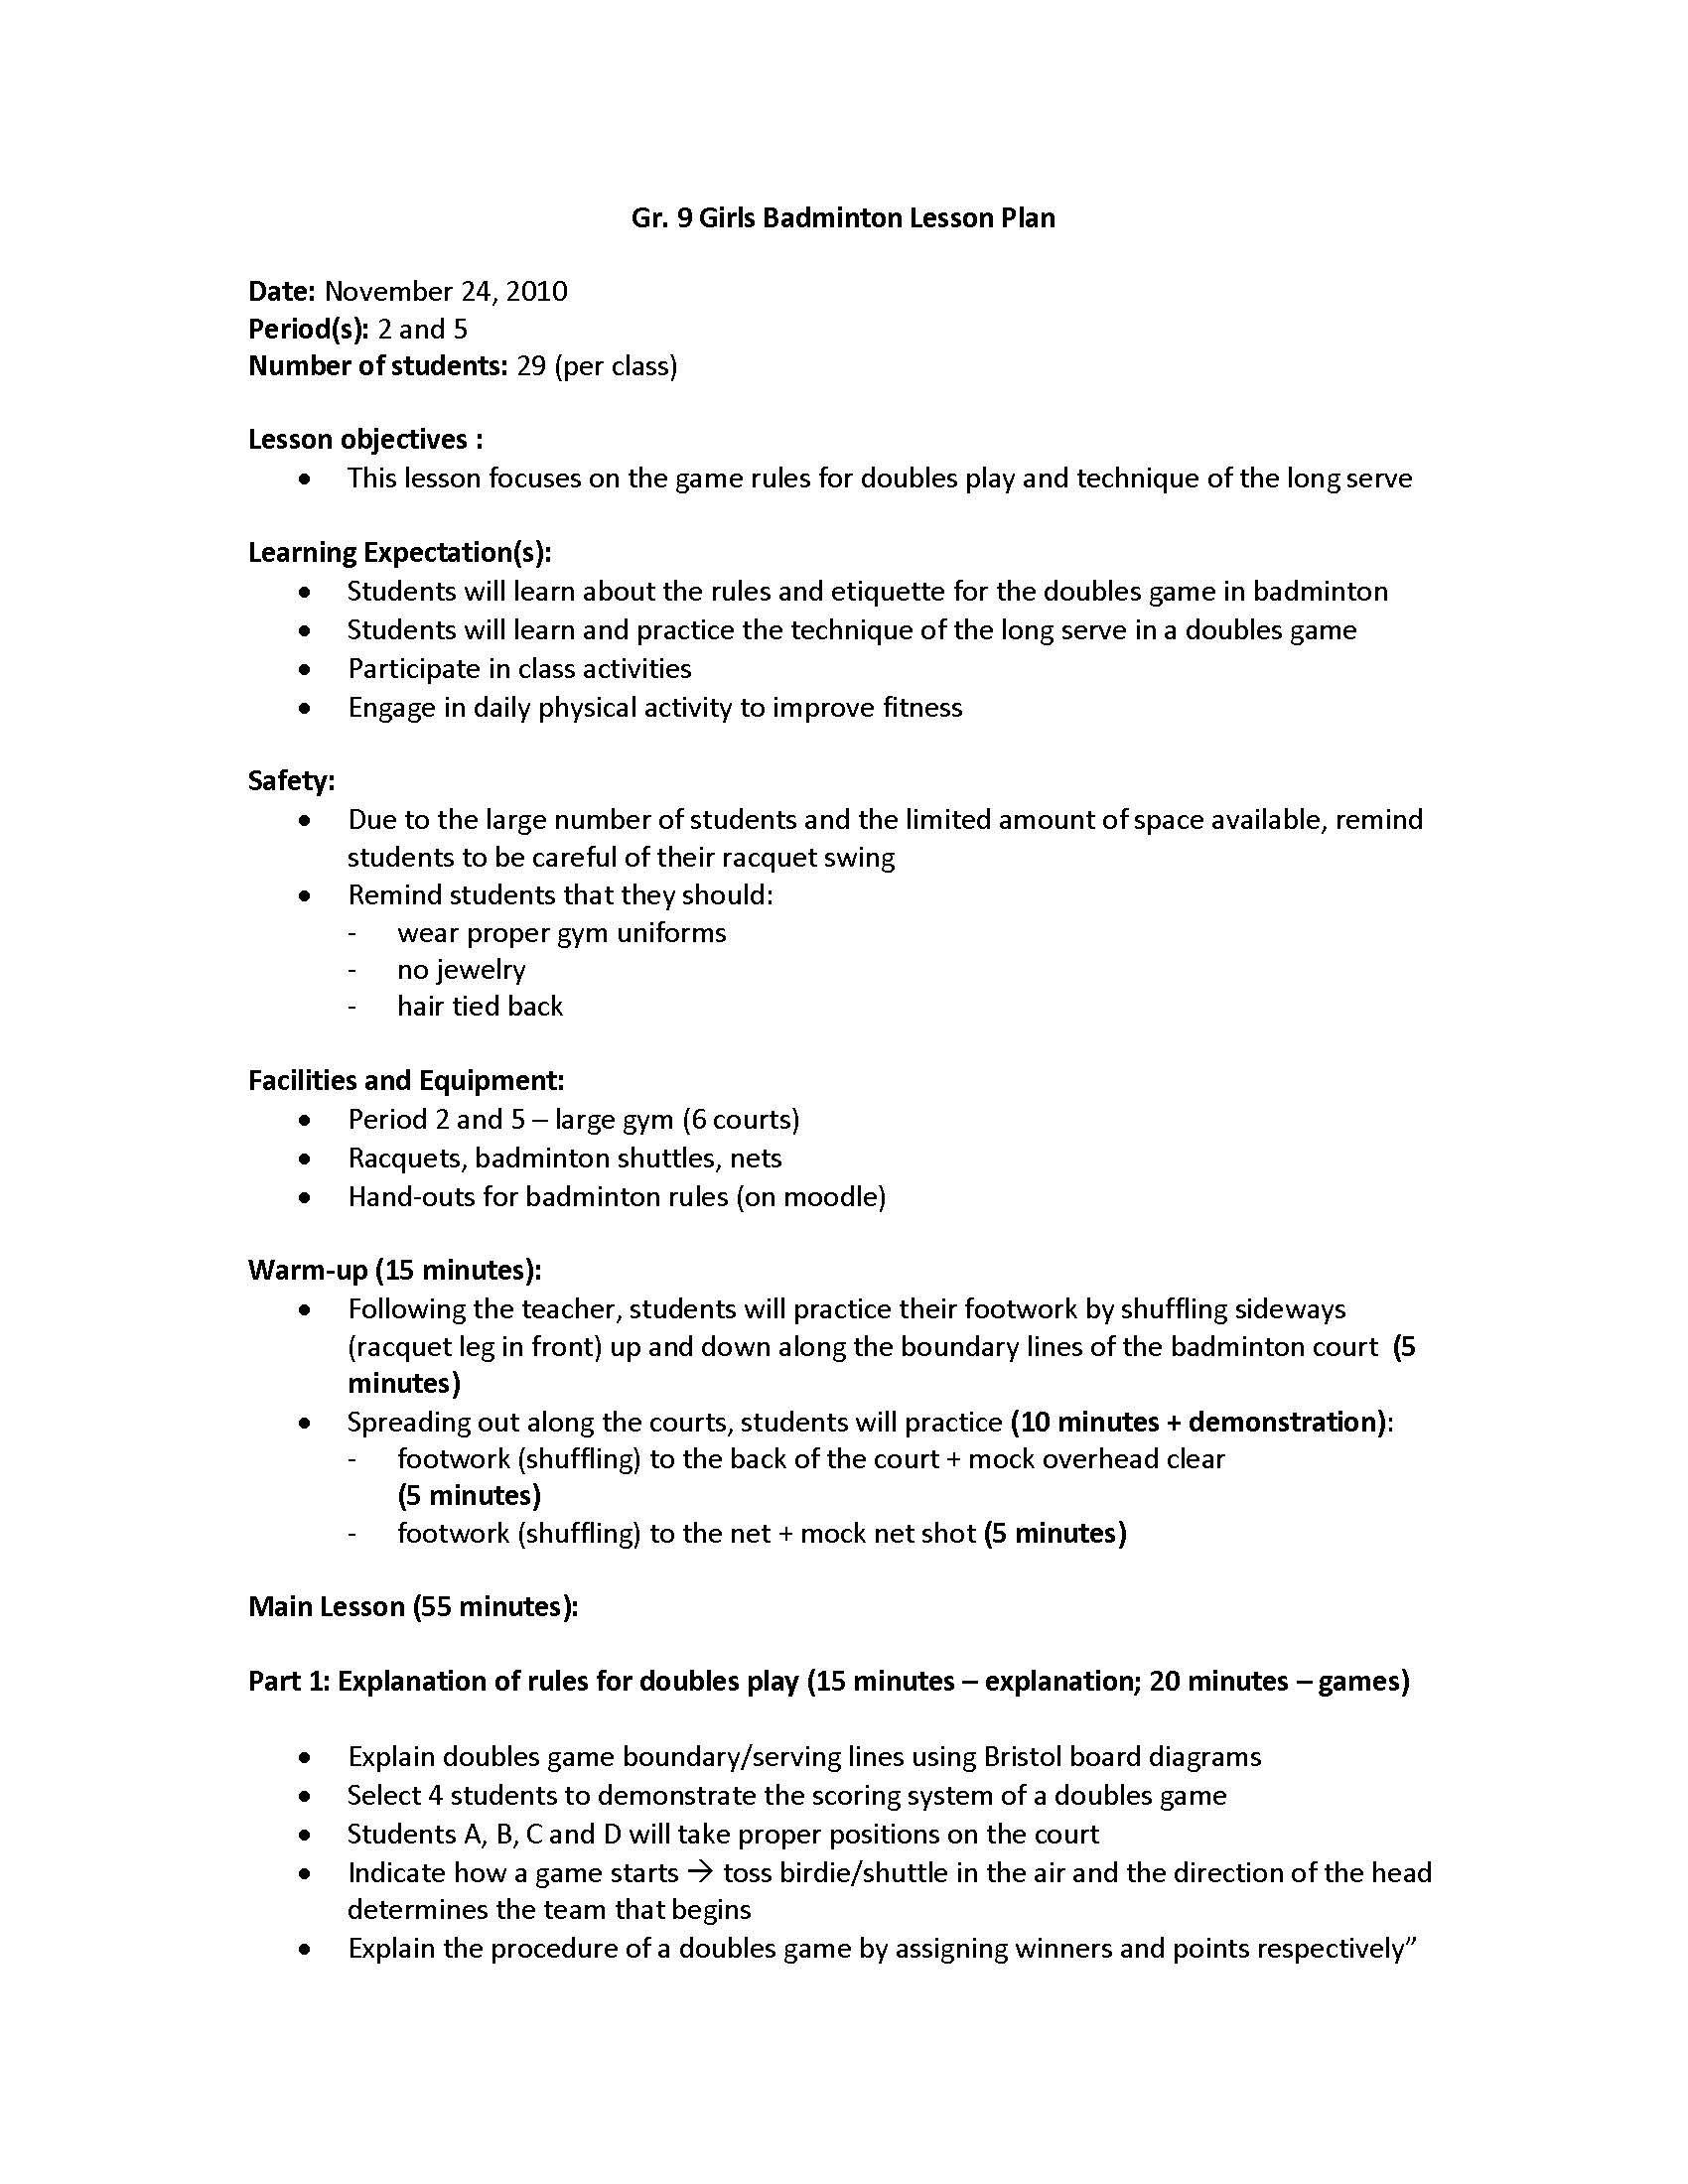 Gr 9 Badminton Lesson Plan